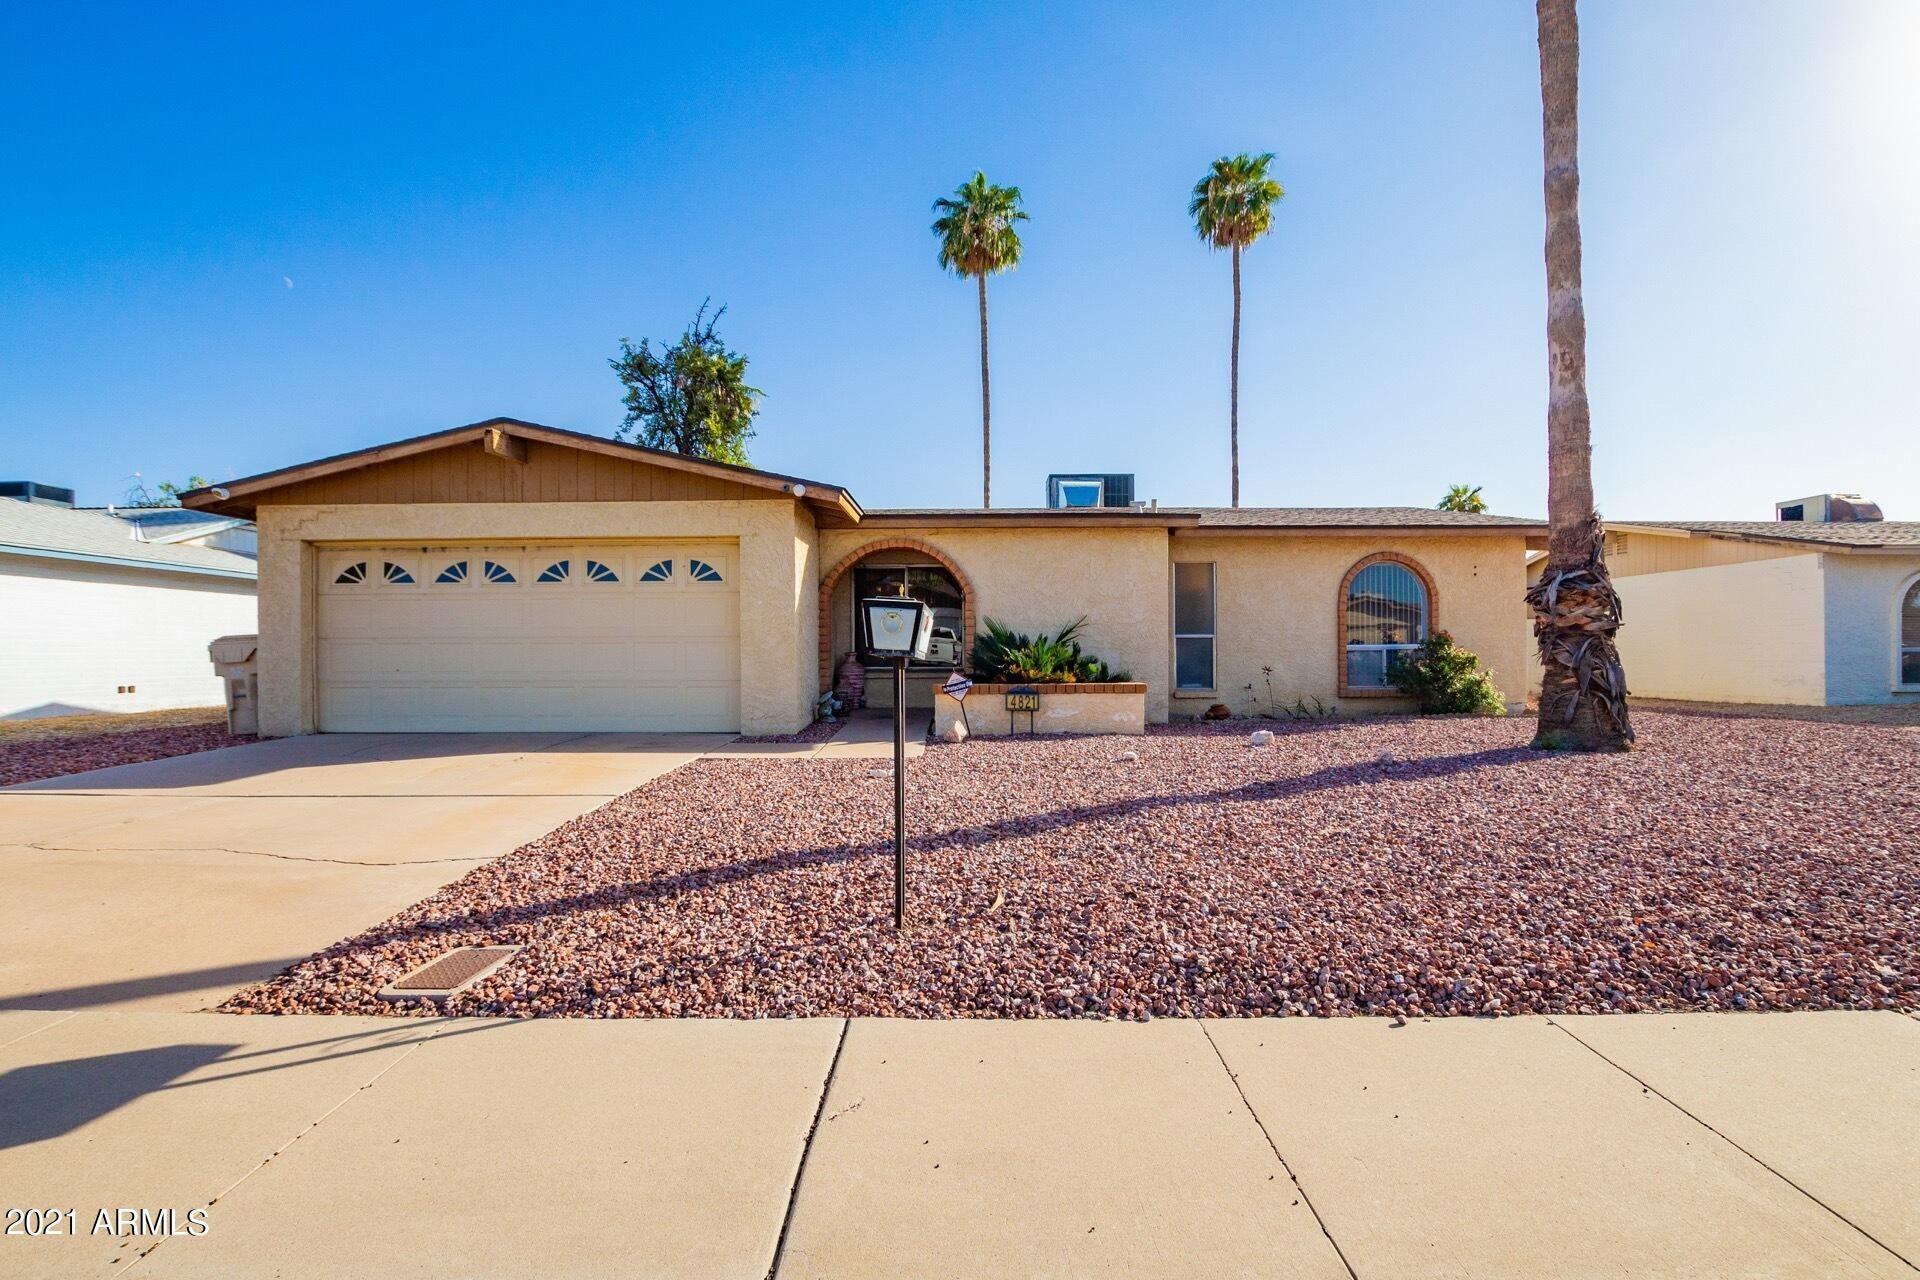 Photo of 4821 W SHANGRI LA Road, Glendale, AZ 85304 (MLS # 6307419)